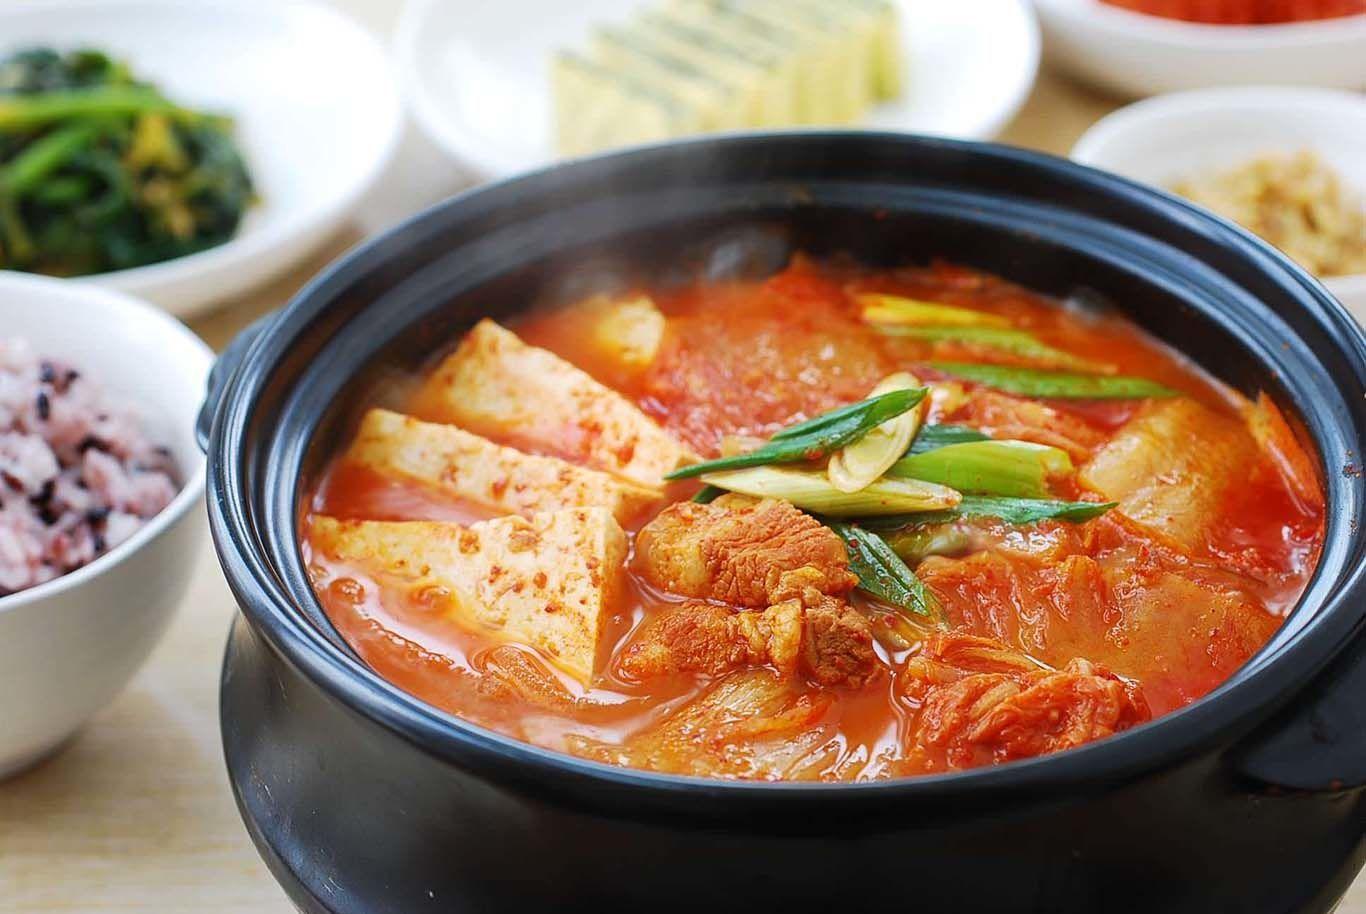 10 Makanan Korea Selatan yang Wajib Kamu Coba Sekali Seumur Hidup